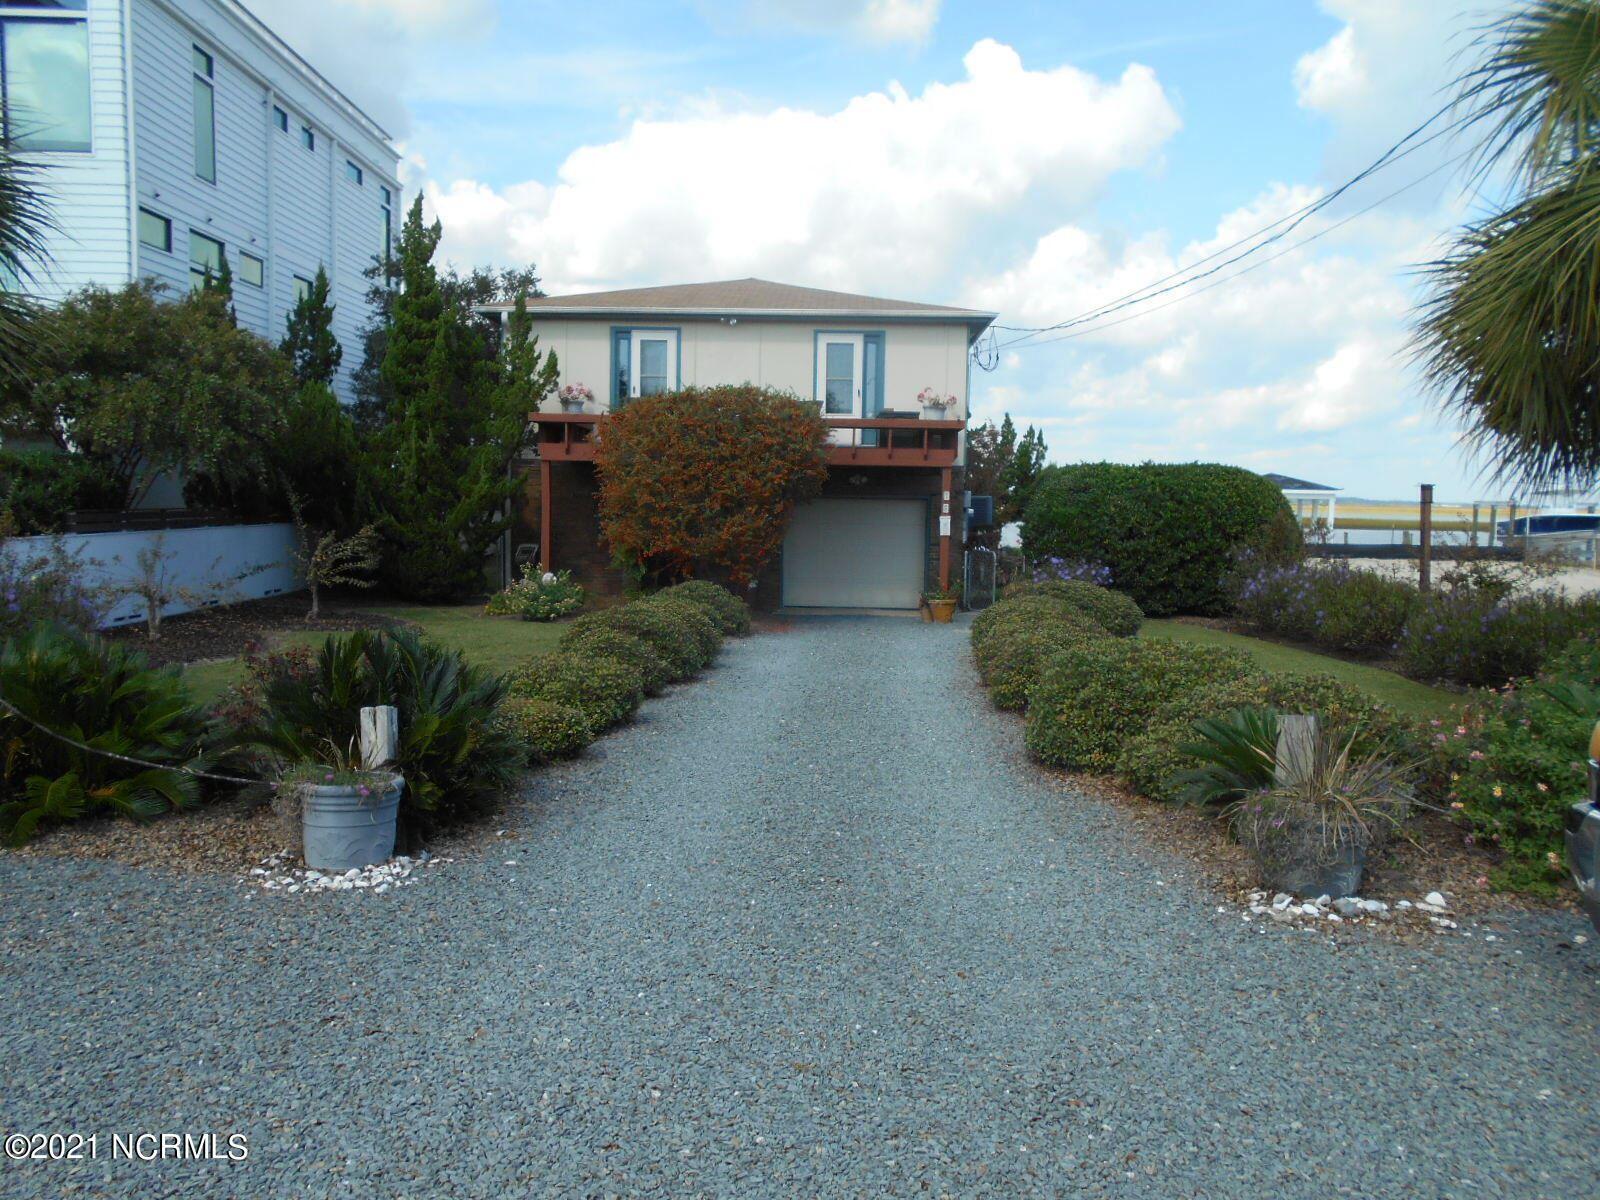 Photo of 18 Pelican Drive, Wrightsville Beach, NC 28480 (MLS # 100295086)